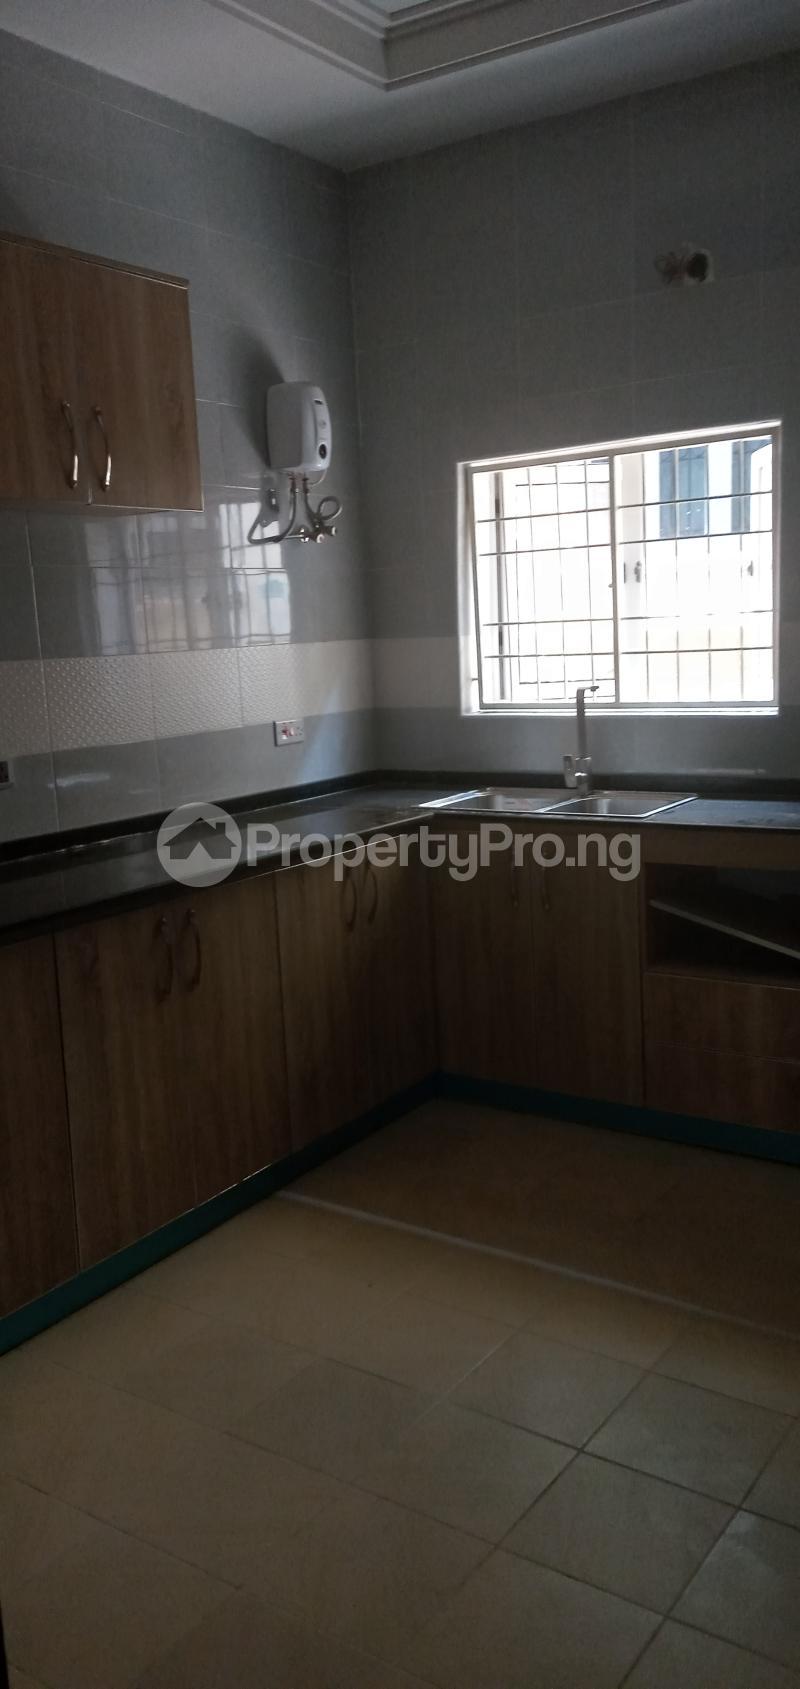 4 bedroom Terraced Duplex House for sale Close To Nnpc Guzape Guzape Abuja - 5